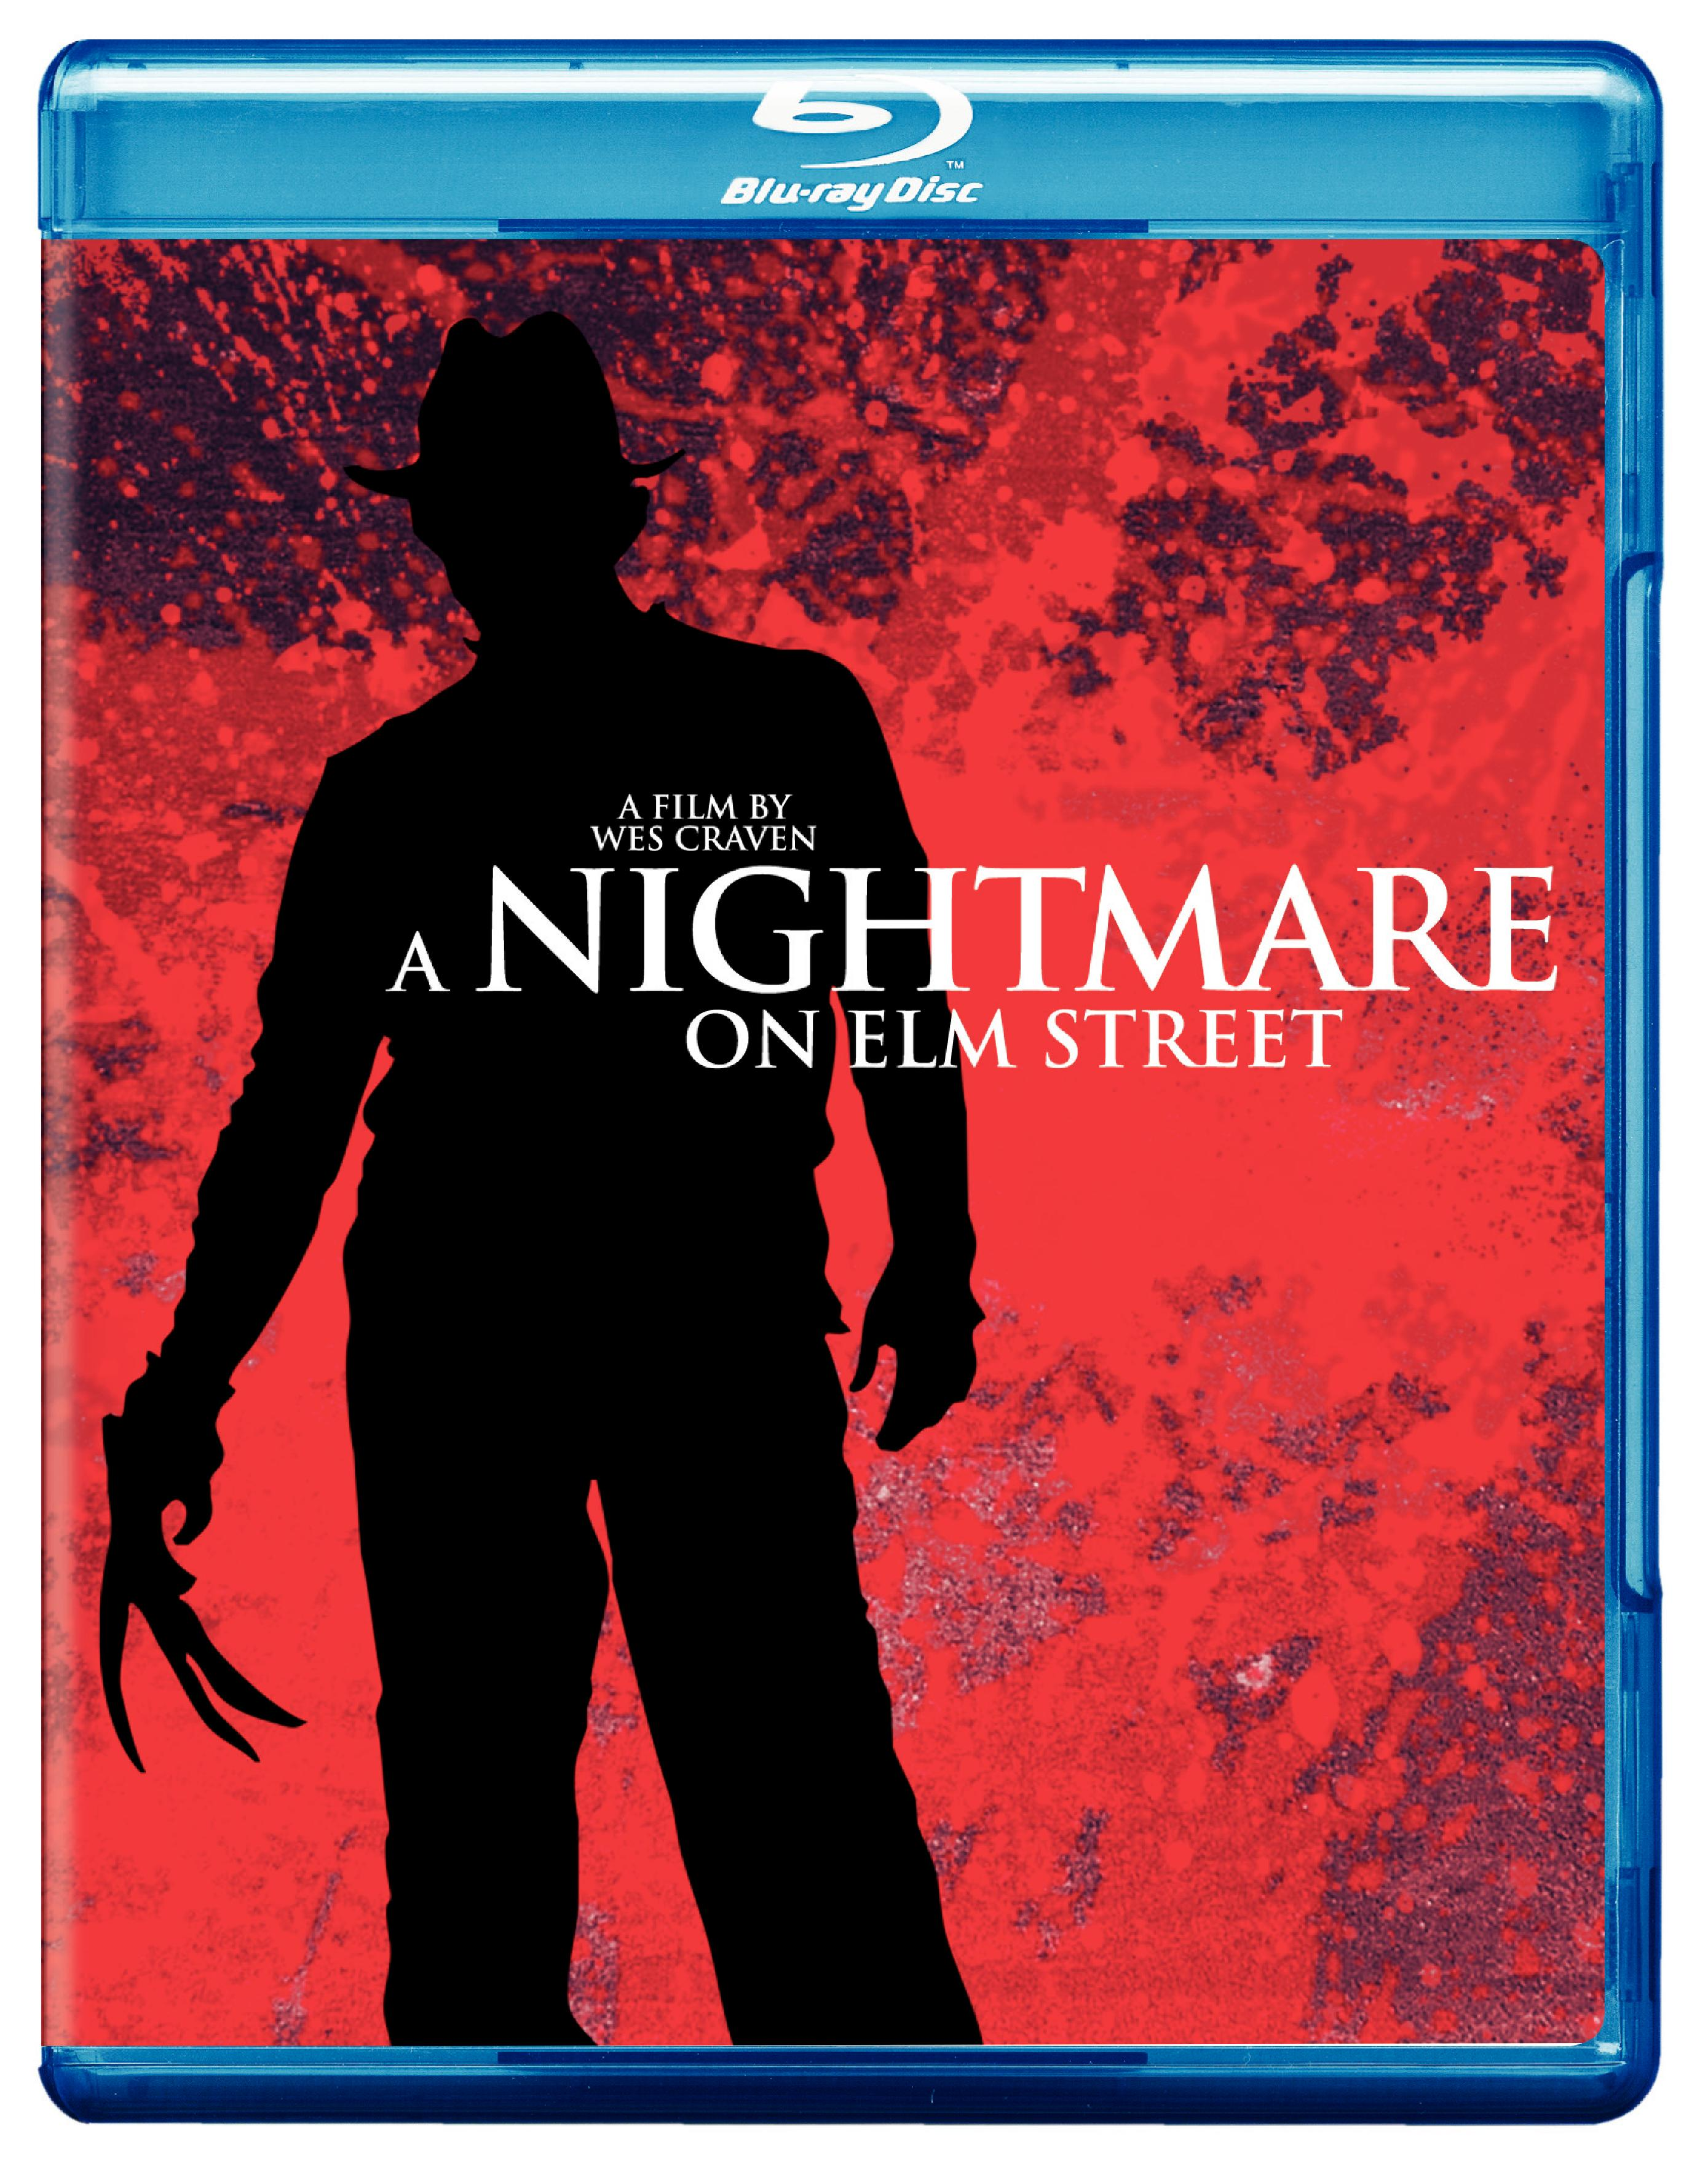 a-nightmare-on-elm-street-blu-ray.jpg